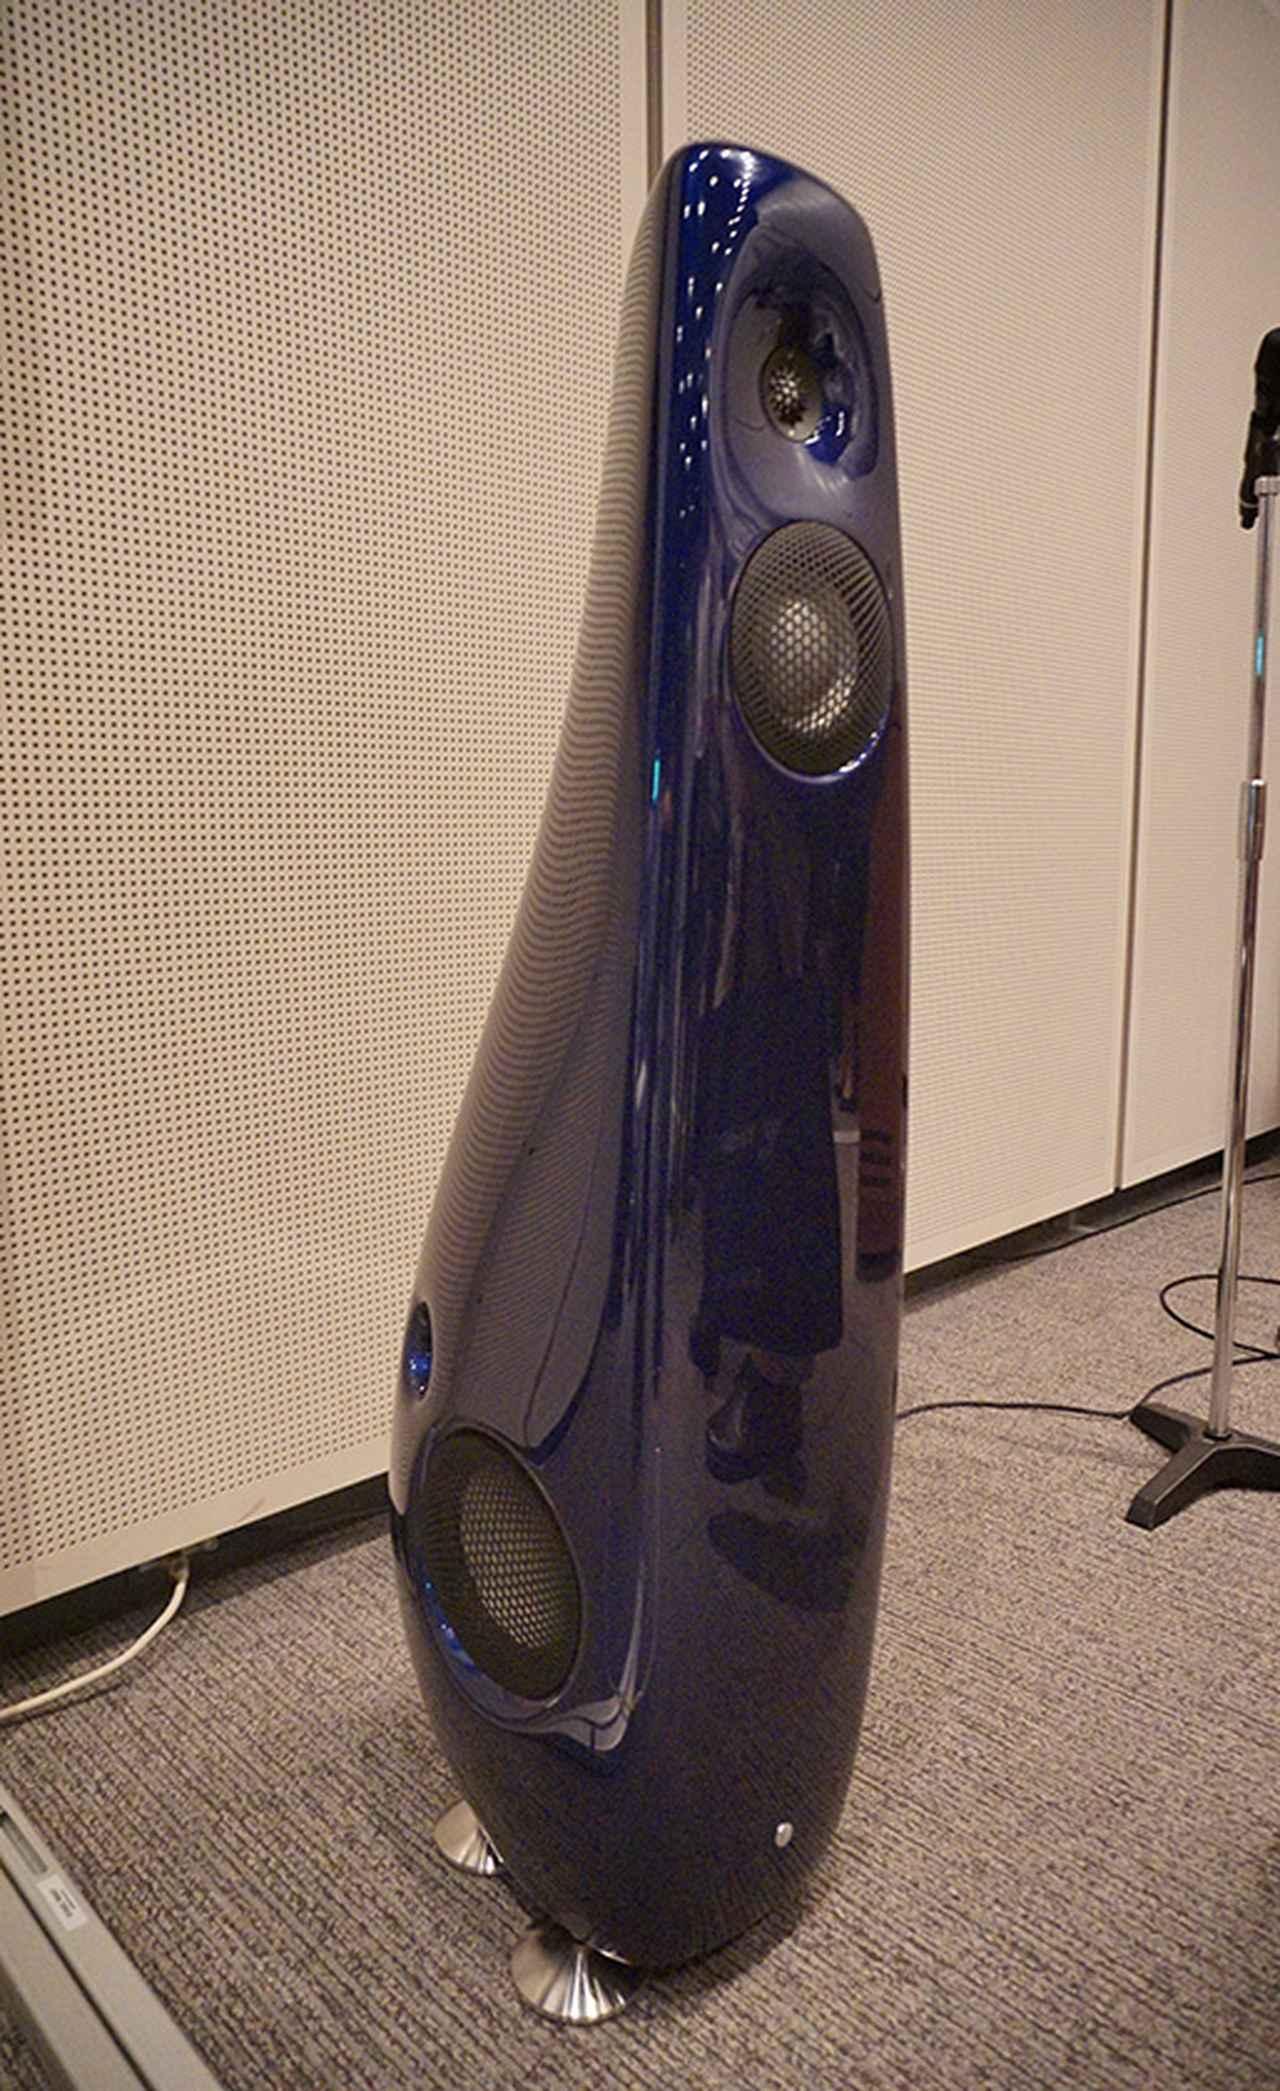 Images : 6番目の画像 - 「VIVID audio、新スピーカー「KAYA」シリーズ発売。CEOも来日した発表会の詳細をレポート」のアルバム - Stereo Sound ONLINE